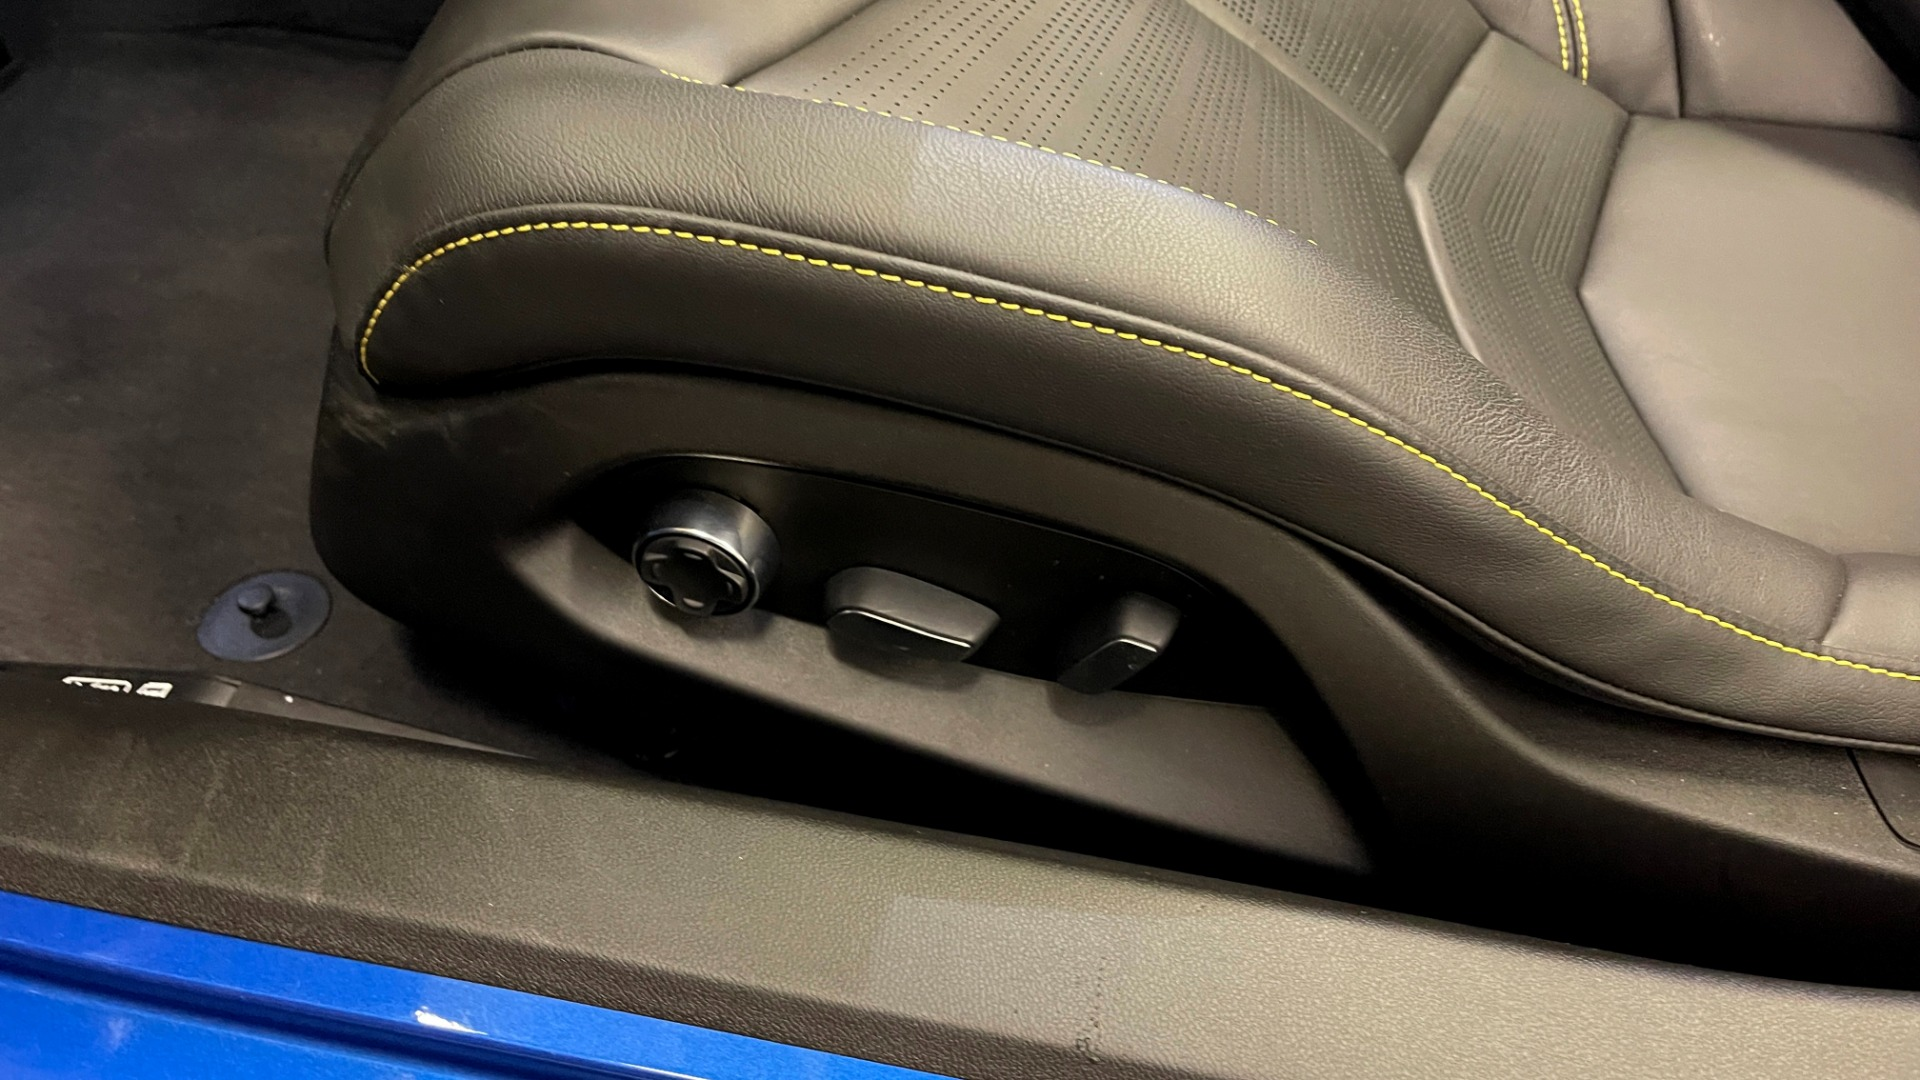 Used 2021 Chevrolet CORVETTE STINGRAY 3LT COUPE / 8-SPD / PERF PKG / NAV / BOSE / REARVIEW for sale $110,995 at Formula Imports in Charlotte NC 28227 39